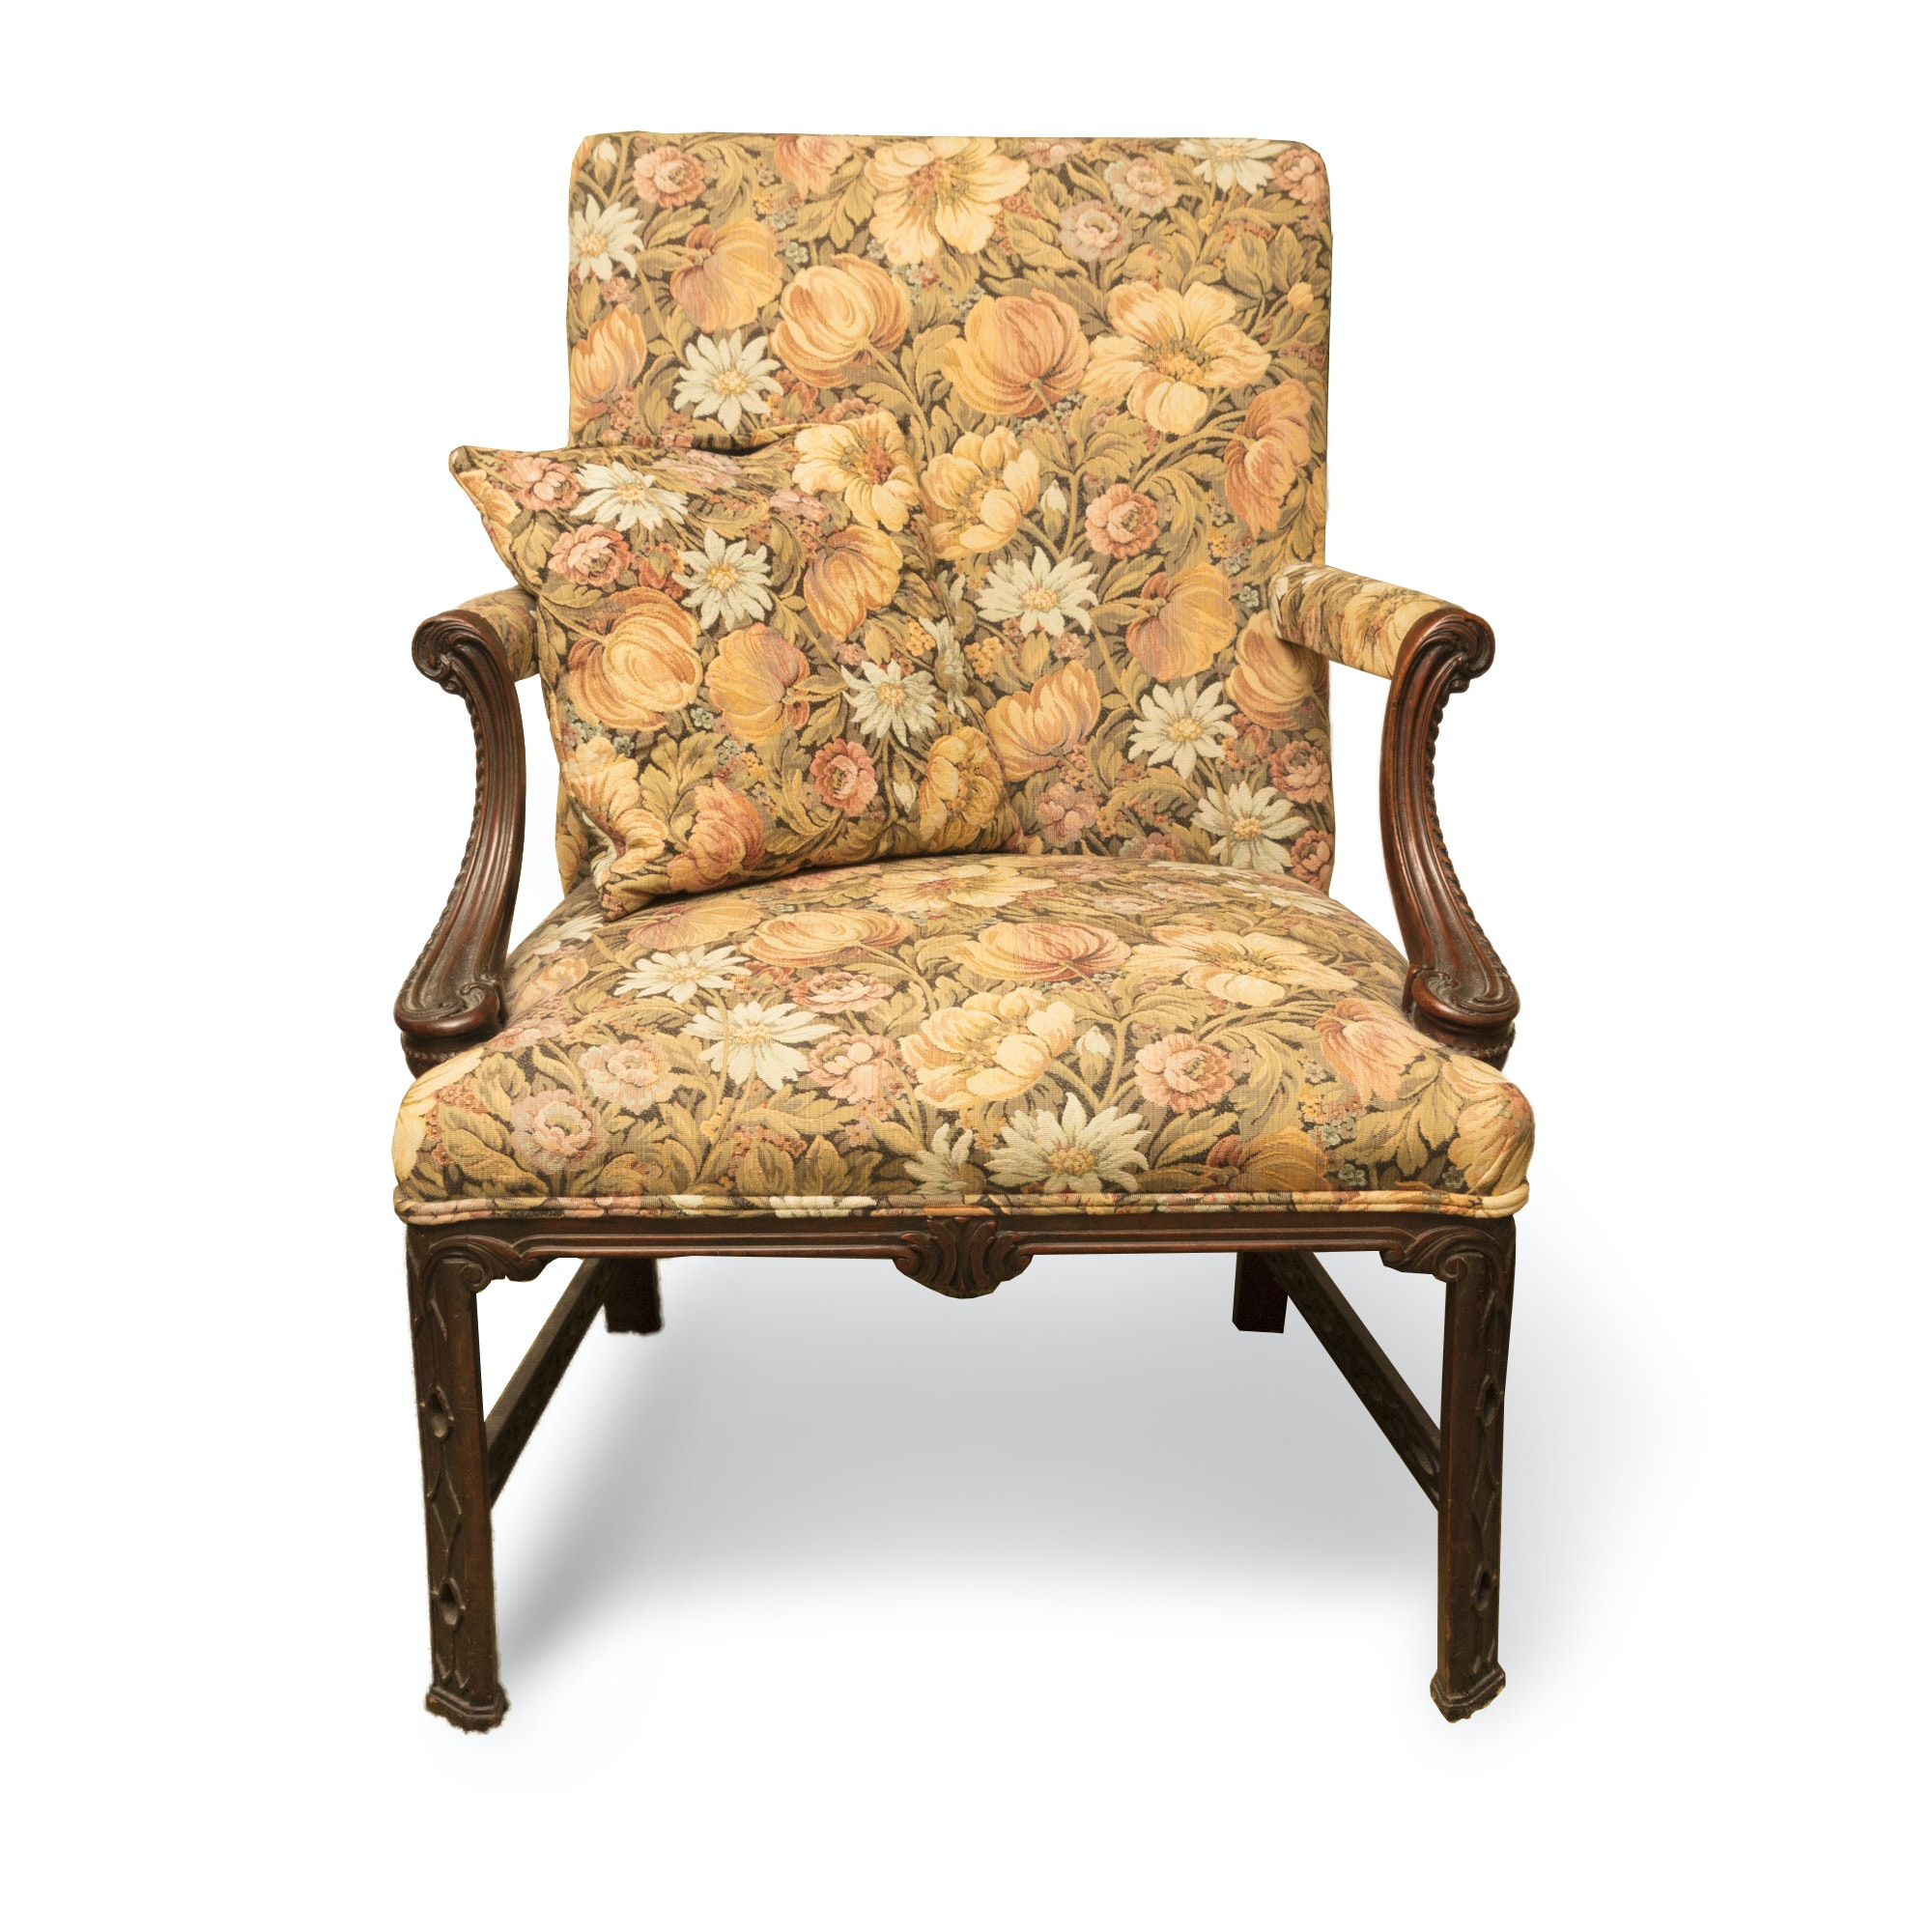 Vintage Floral Upholstered Carved Arm Chair